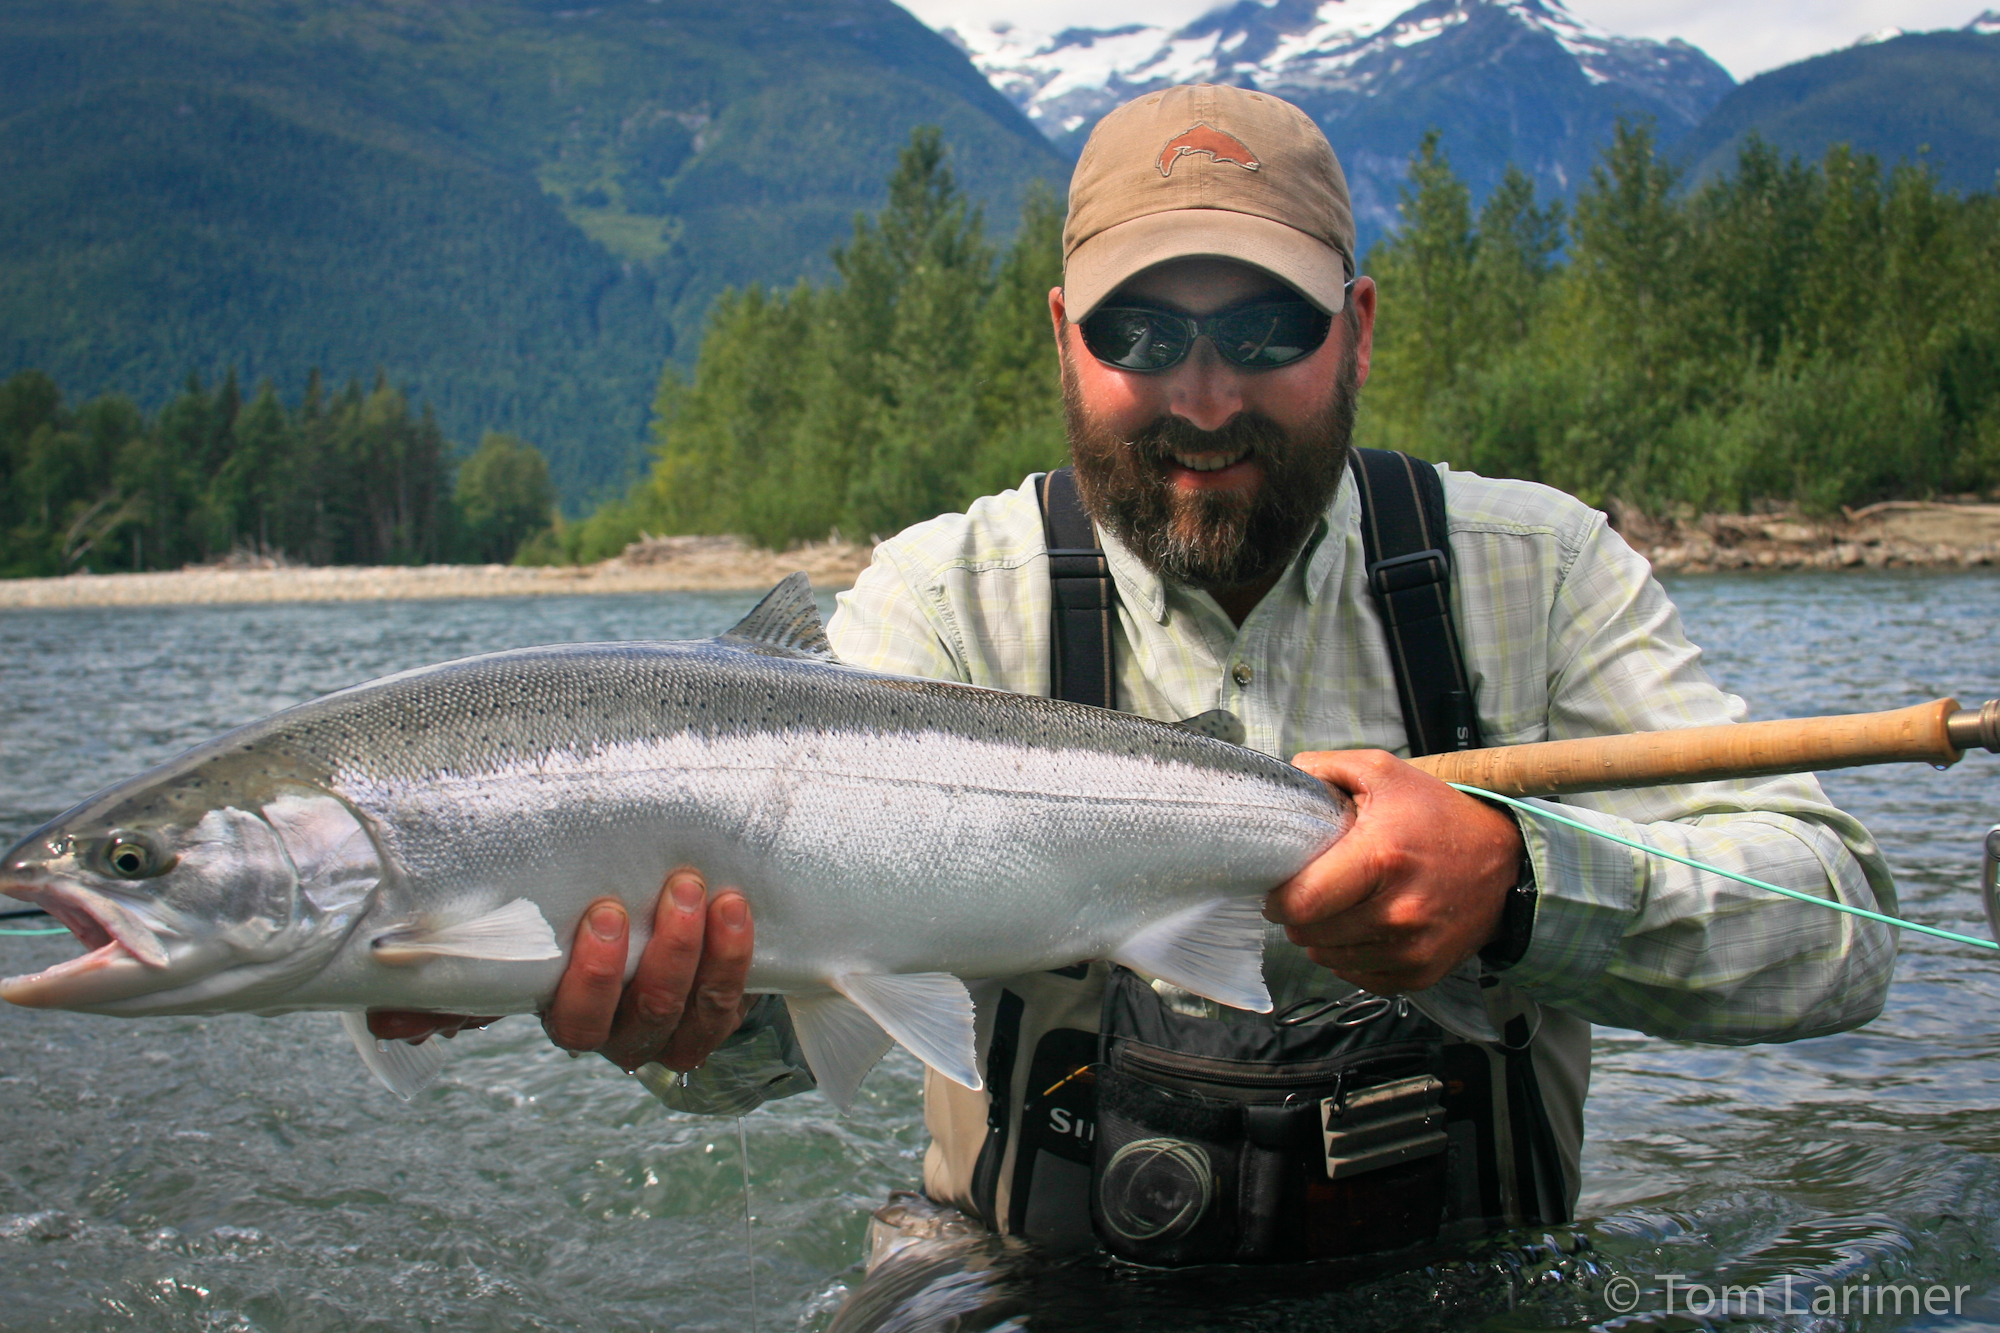 Skagit heads explained hatch magazine fly fishing etc for Steelhead fishing gear